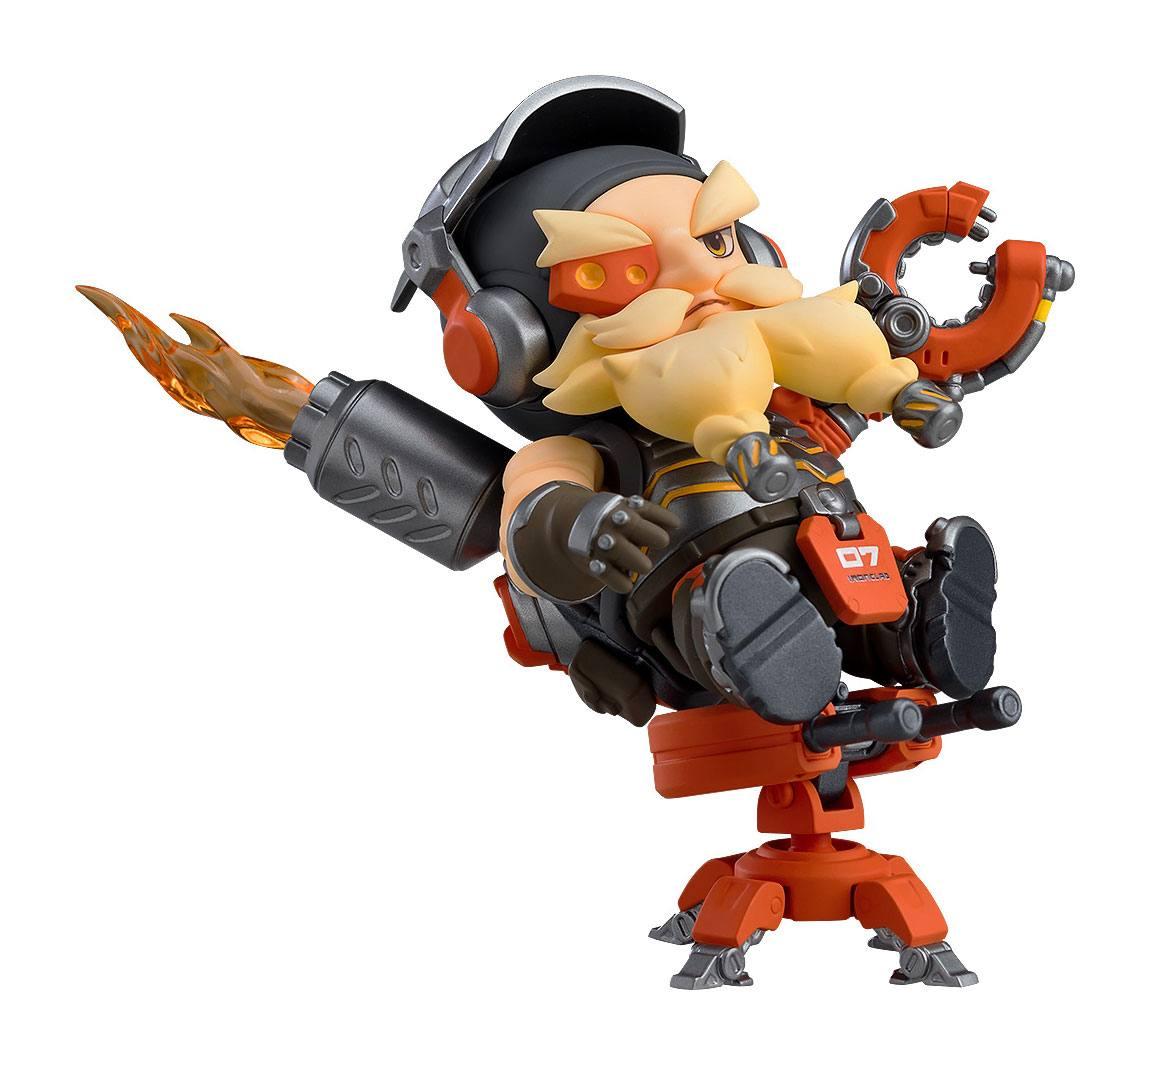 Overwatch Nendoroid Action Figure Torbjrn Classic Skin Edition 10 cm